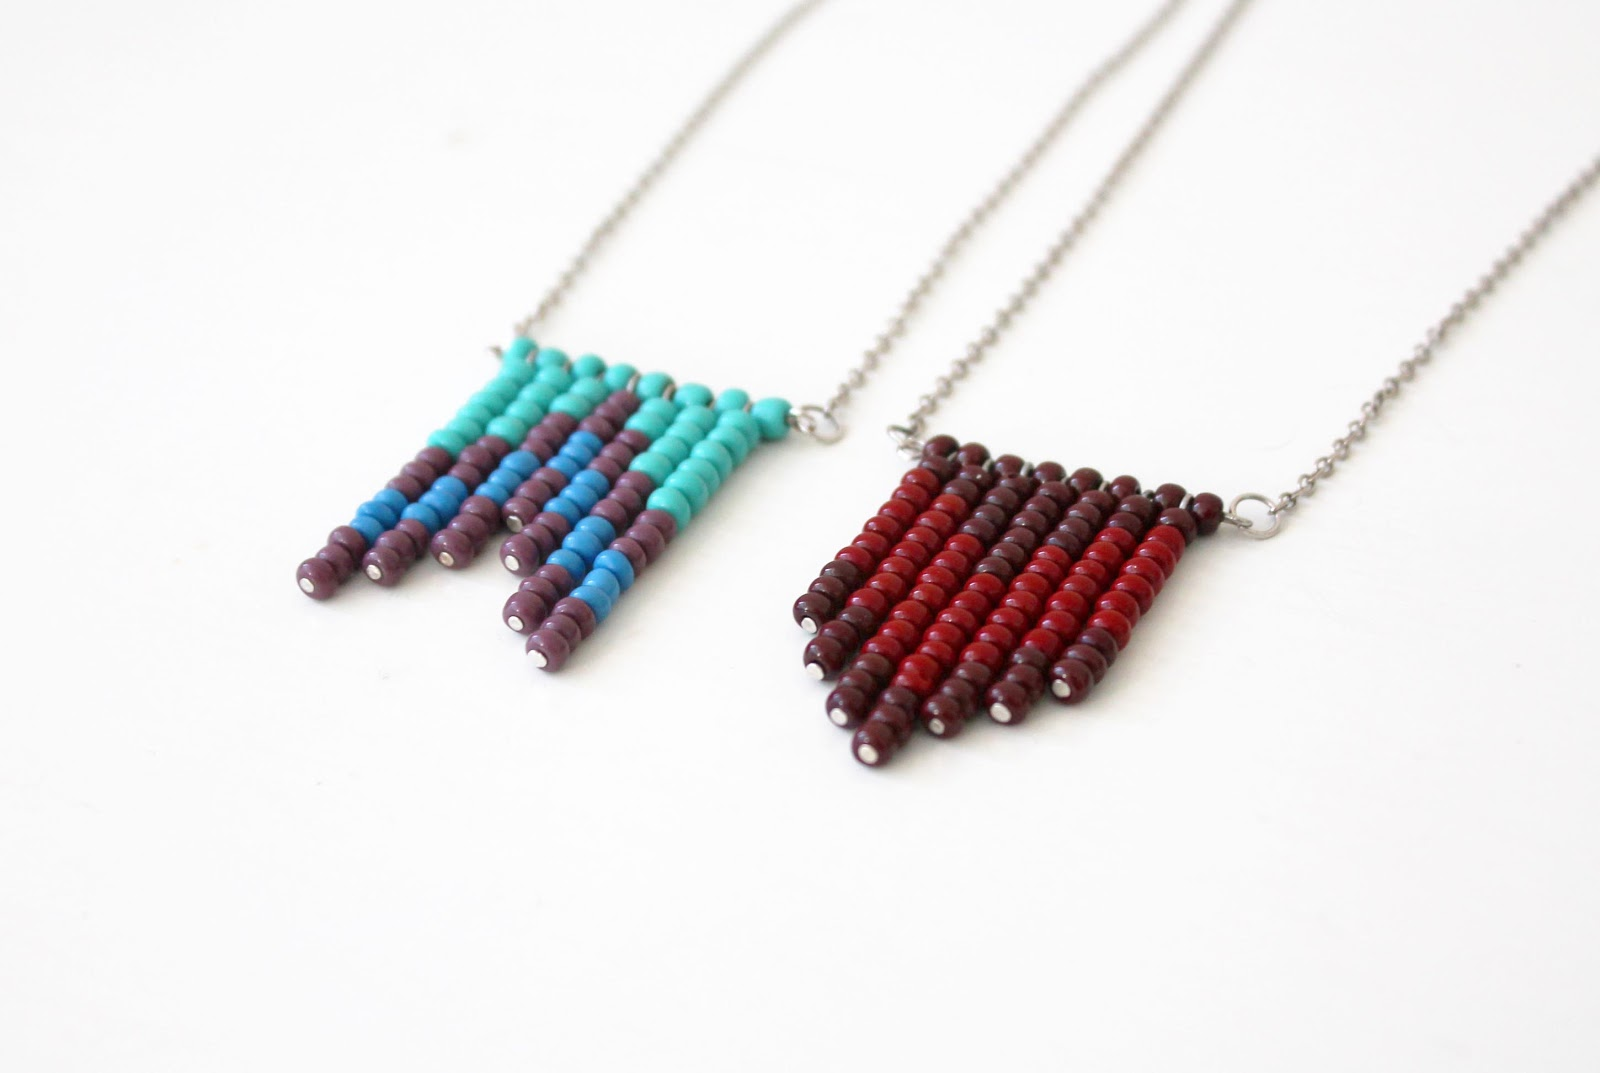 diy necklace pendant - photo #11